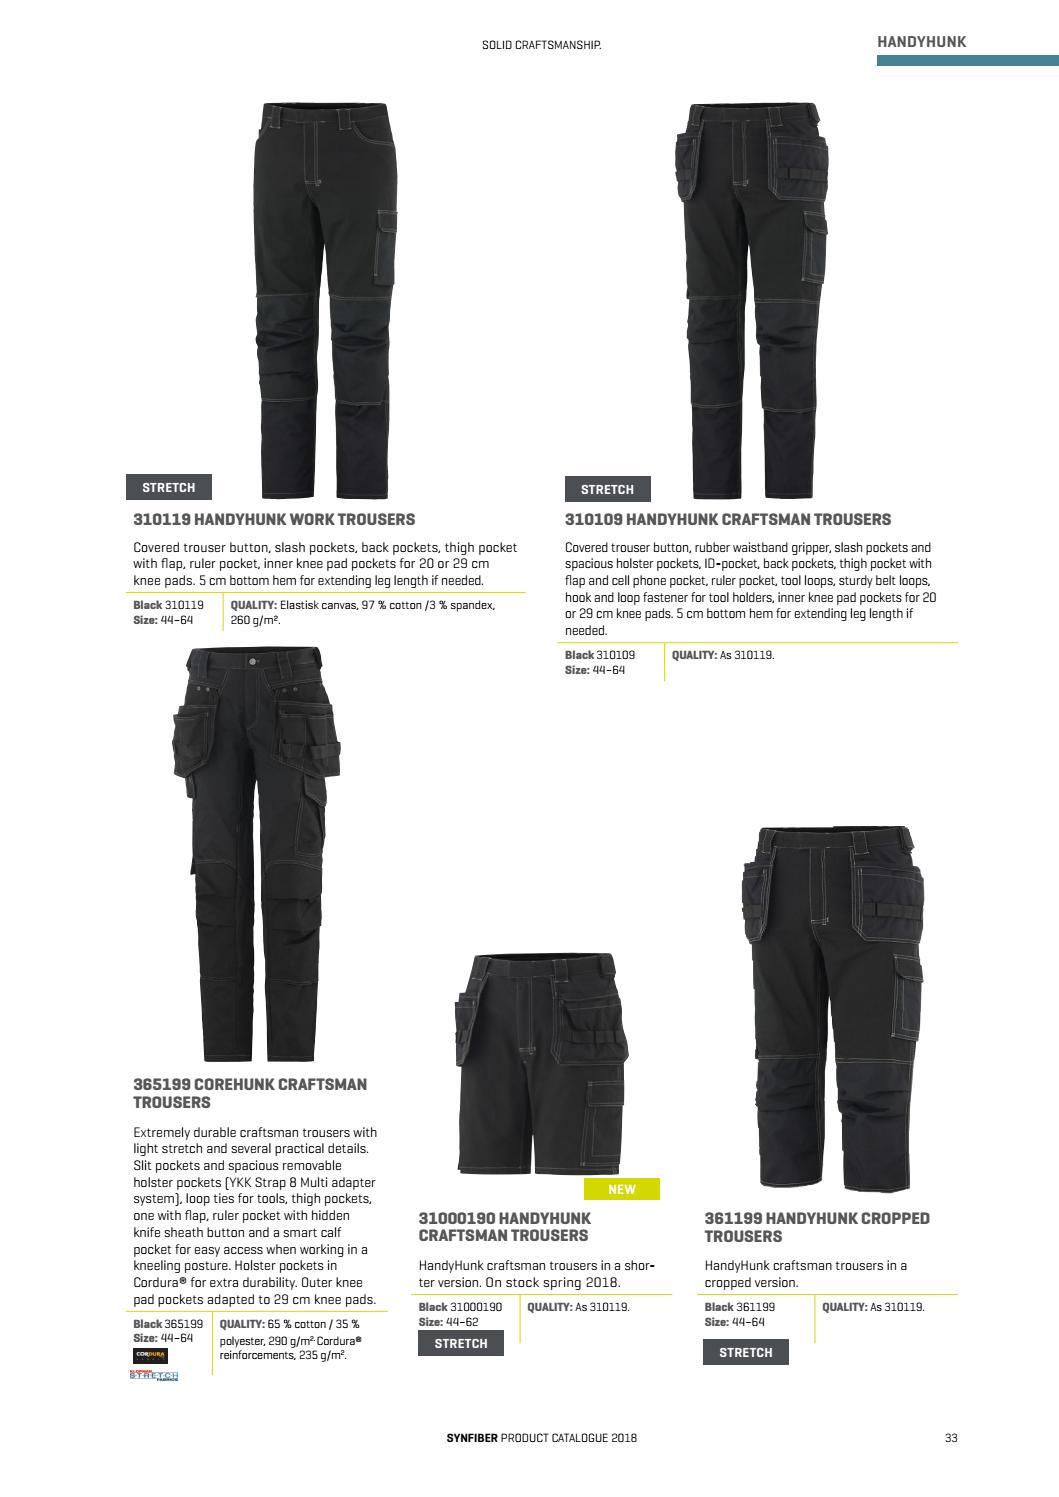 Synfiber Workwear Catalogue 2018 by Synfiber Workwear - issuu